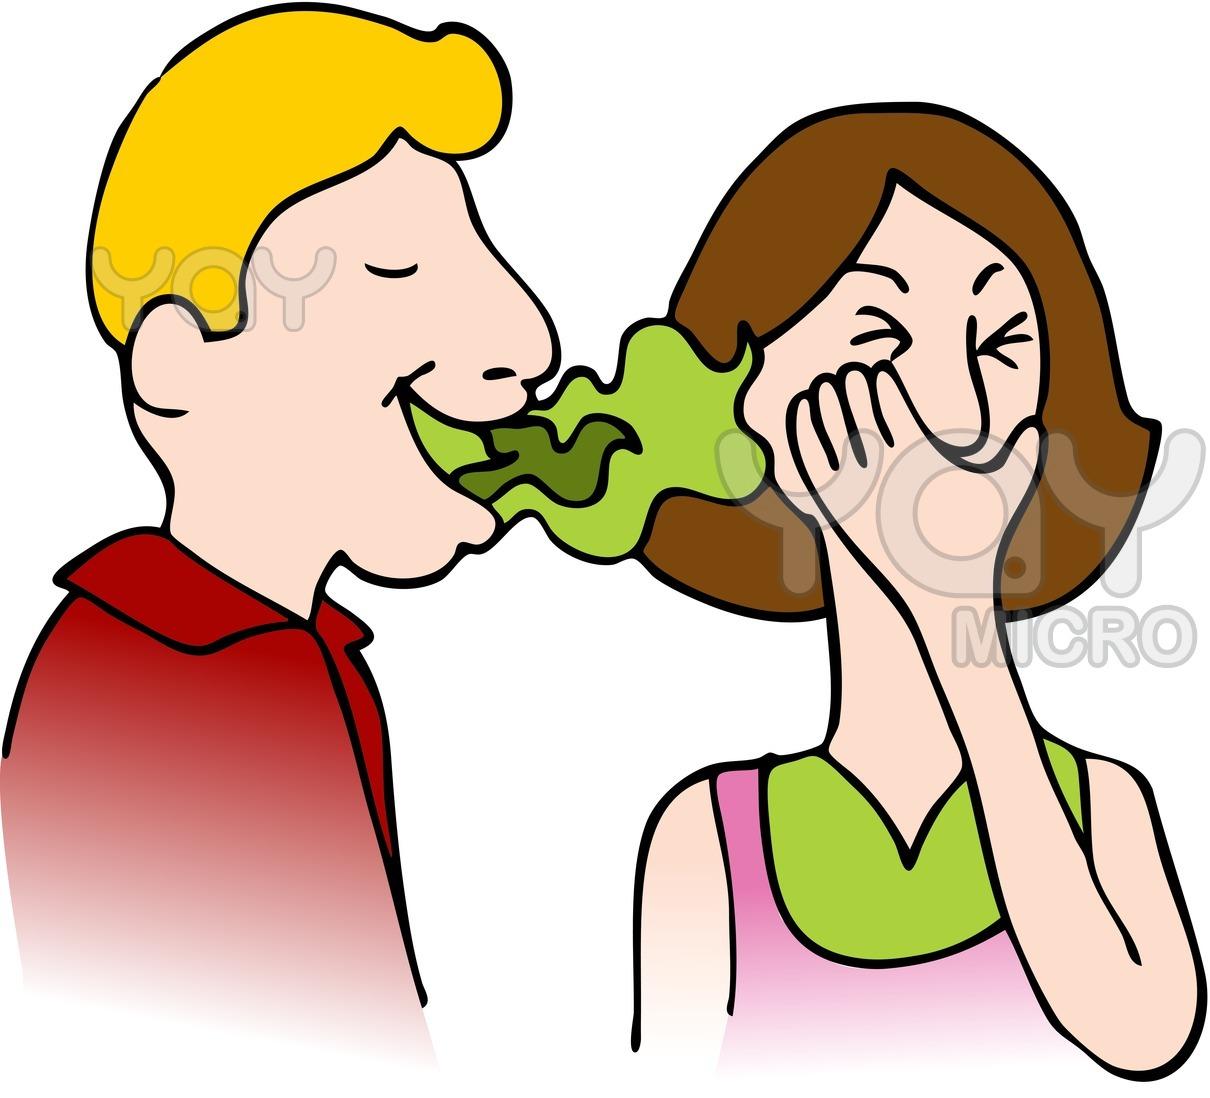 Breath clipart stinky. Smelly